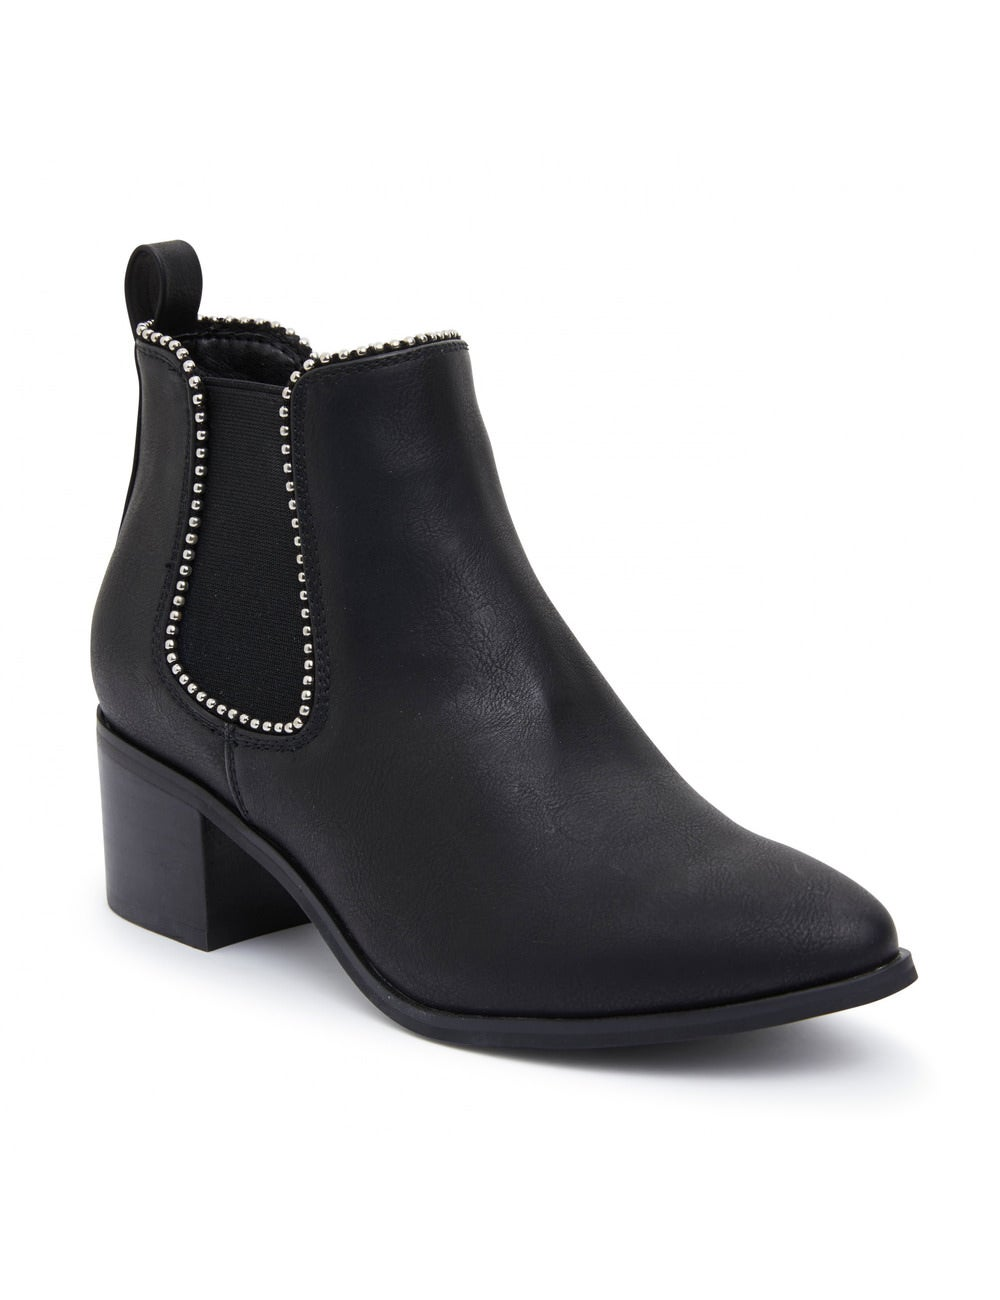 Women's Boots | Rivers Australia